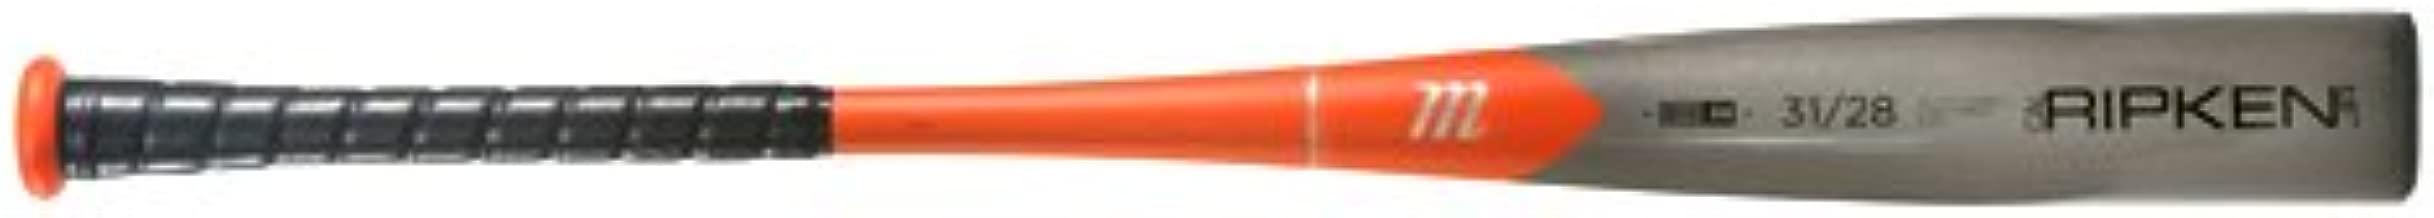 cal ripken jr baseball bat